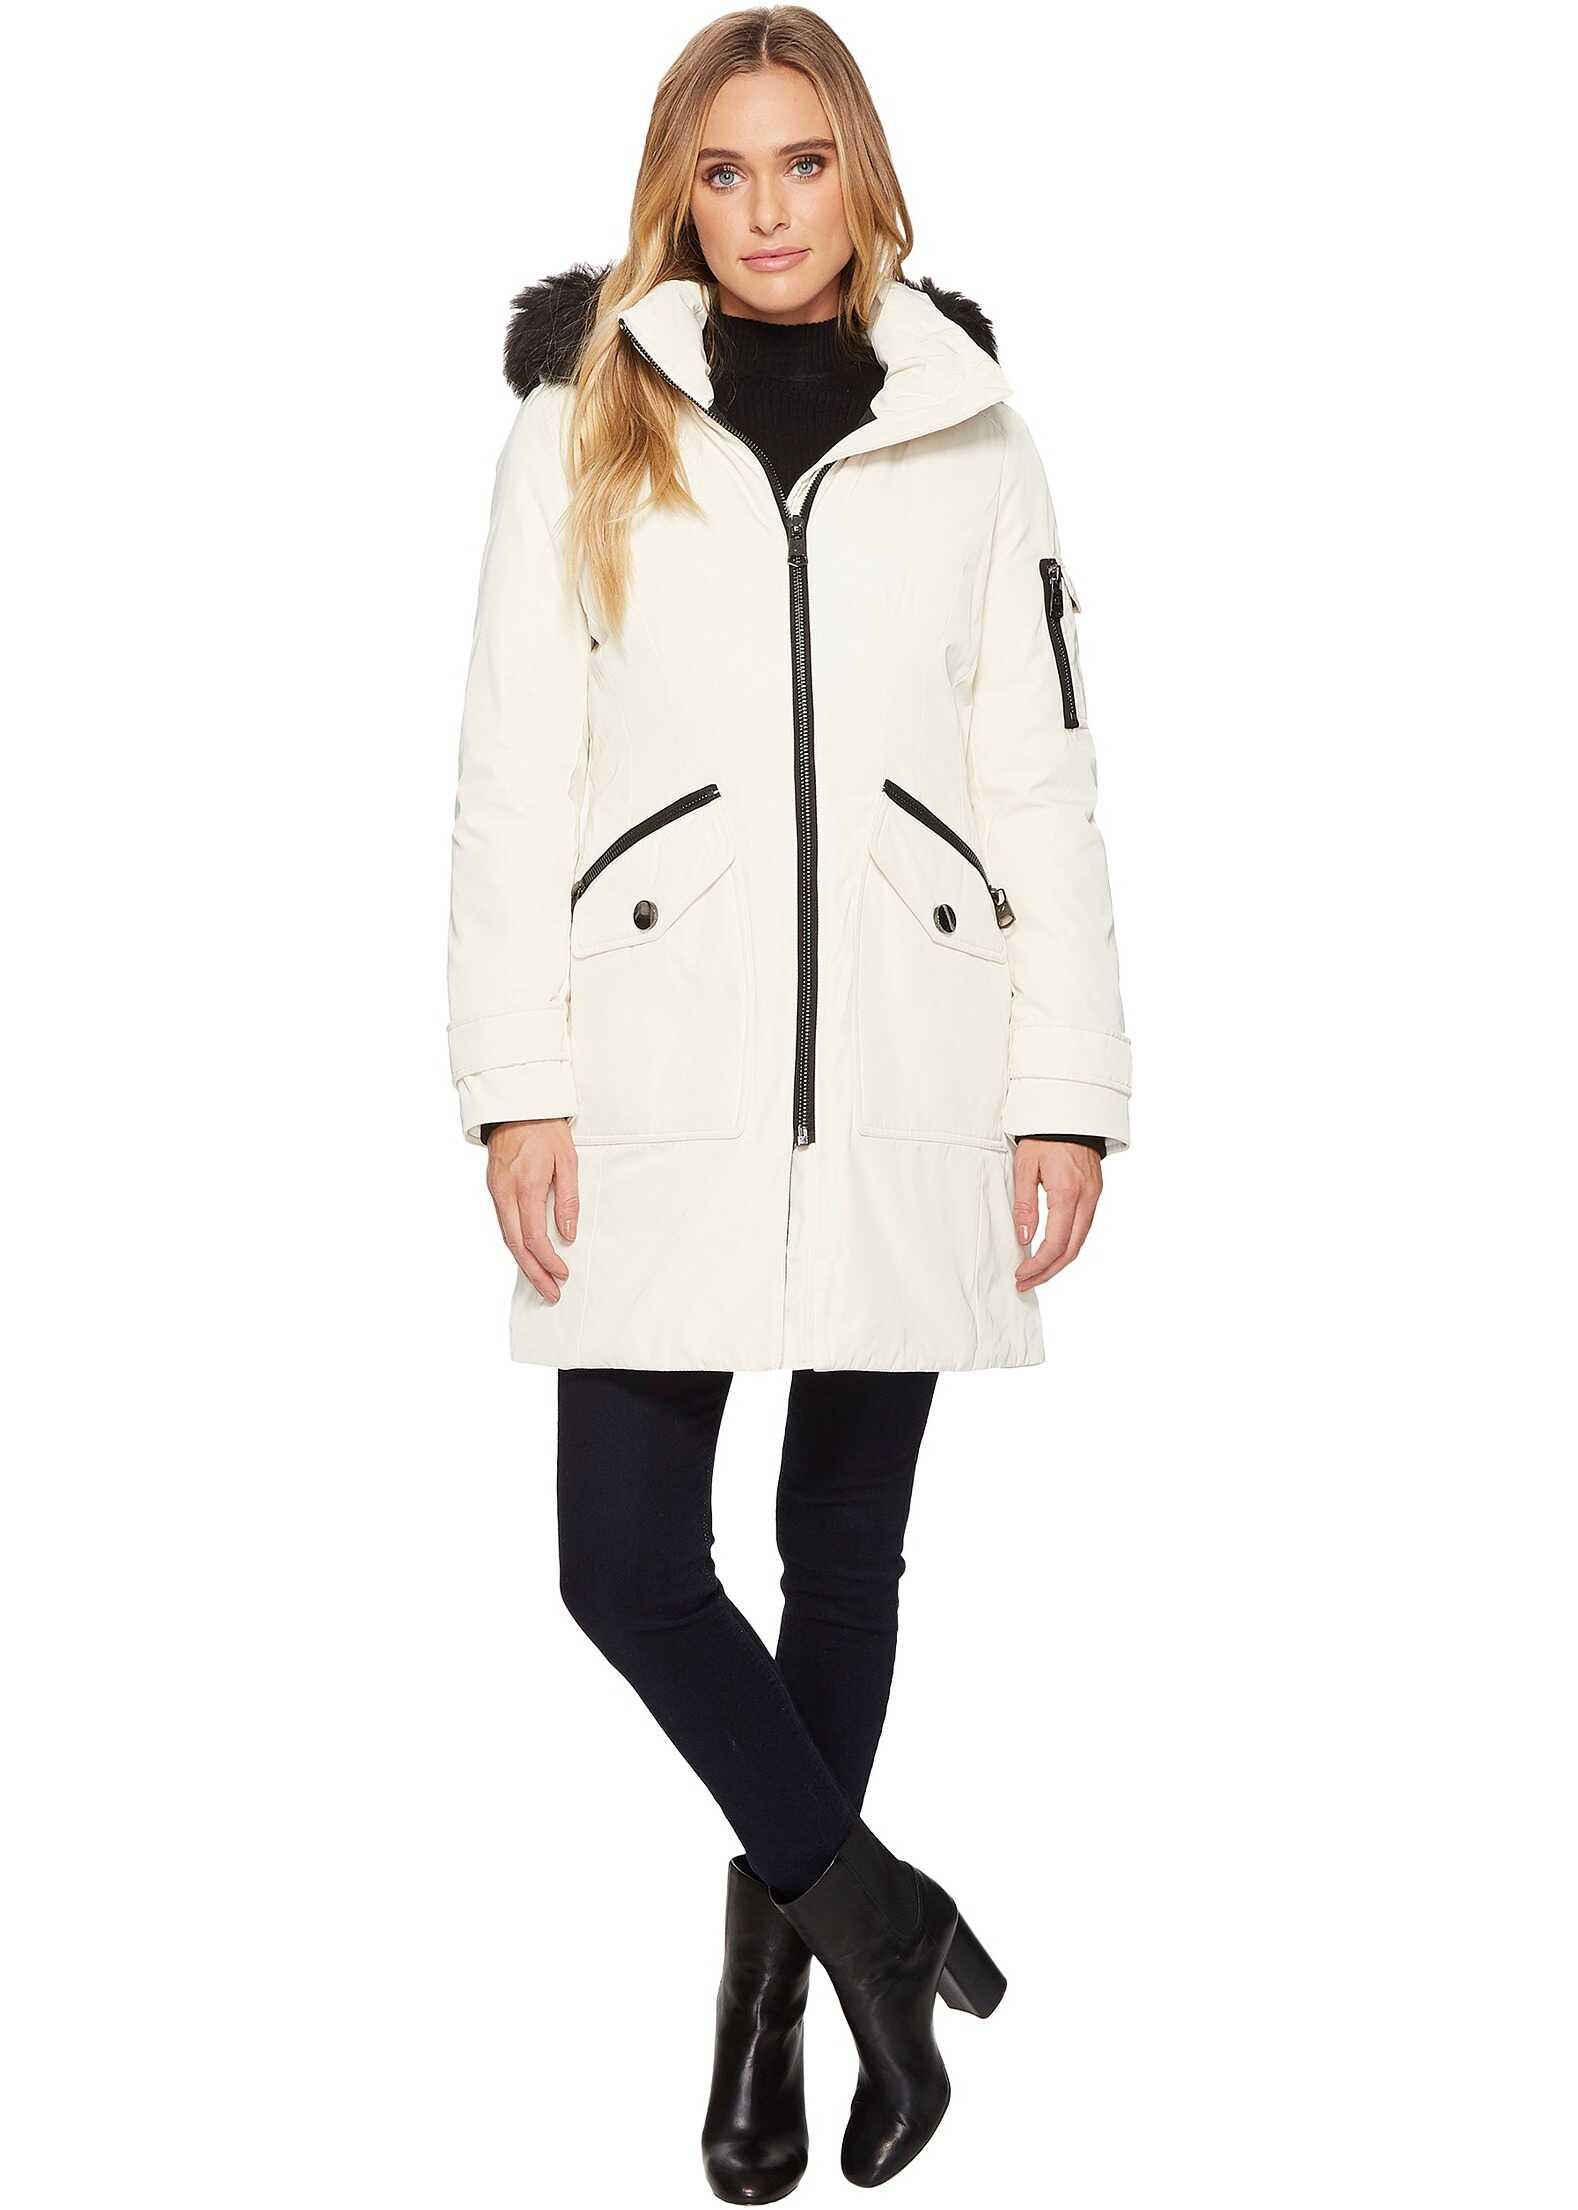 Calvin Klein Parka with Detachable Fur Trimmed Hood Milky White